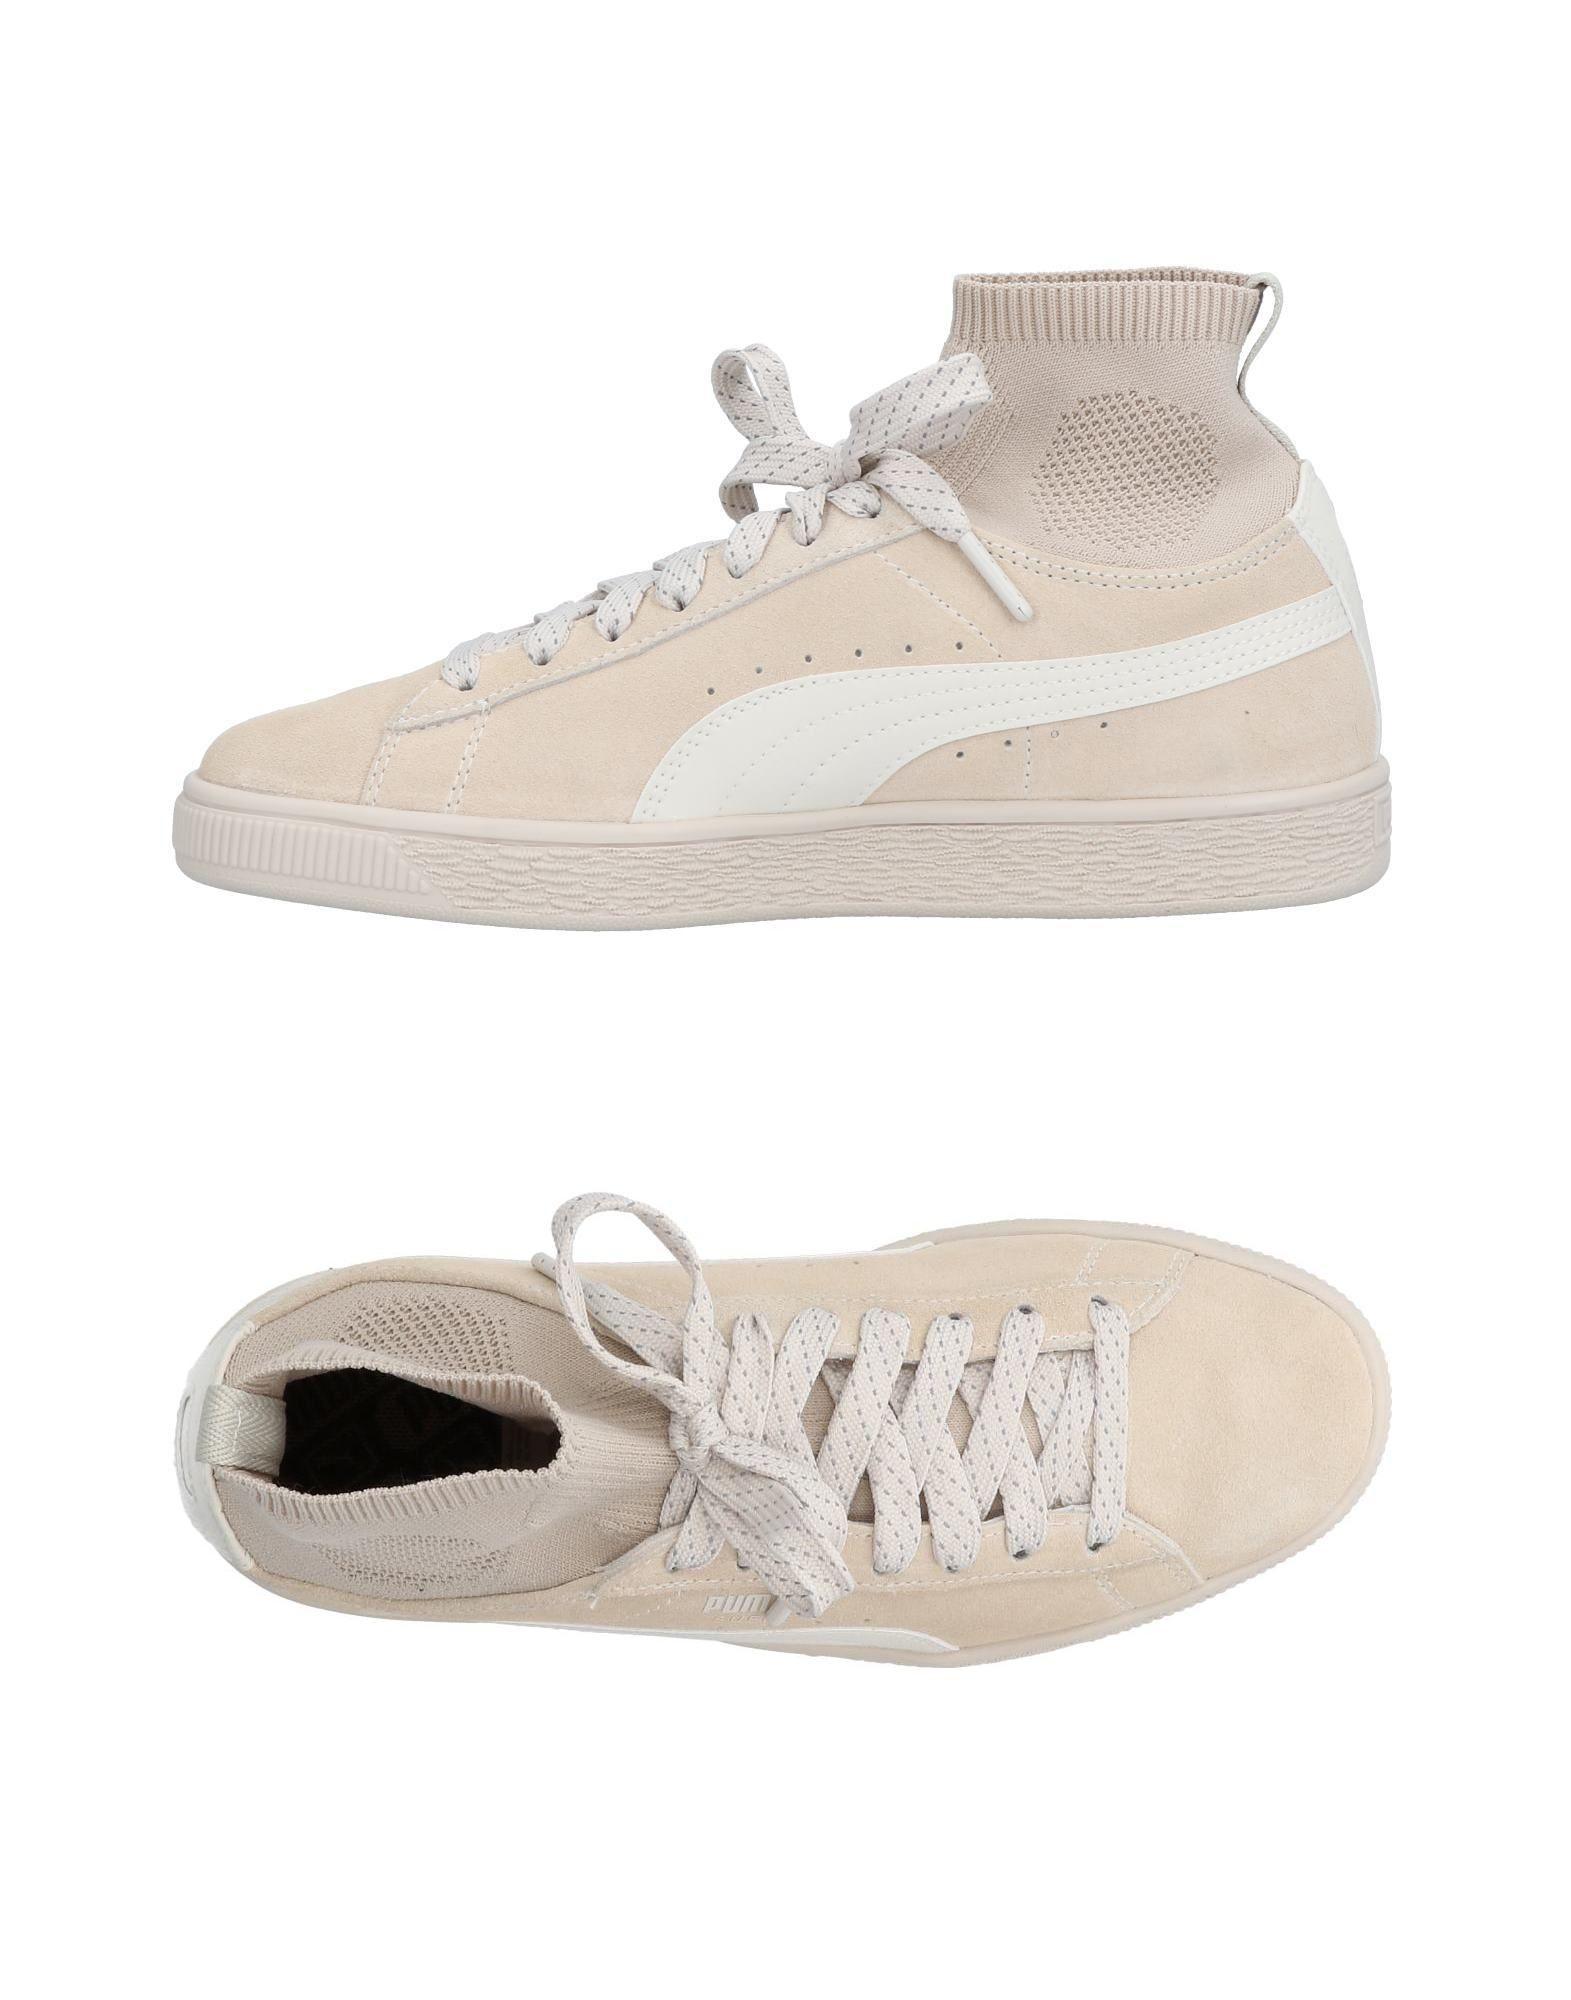 Sneakers Puma Homme - Sneakers Puma  Noir Super rabais